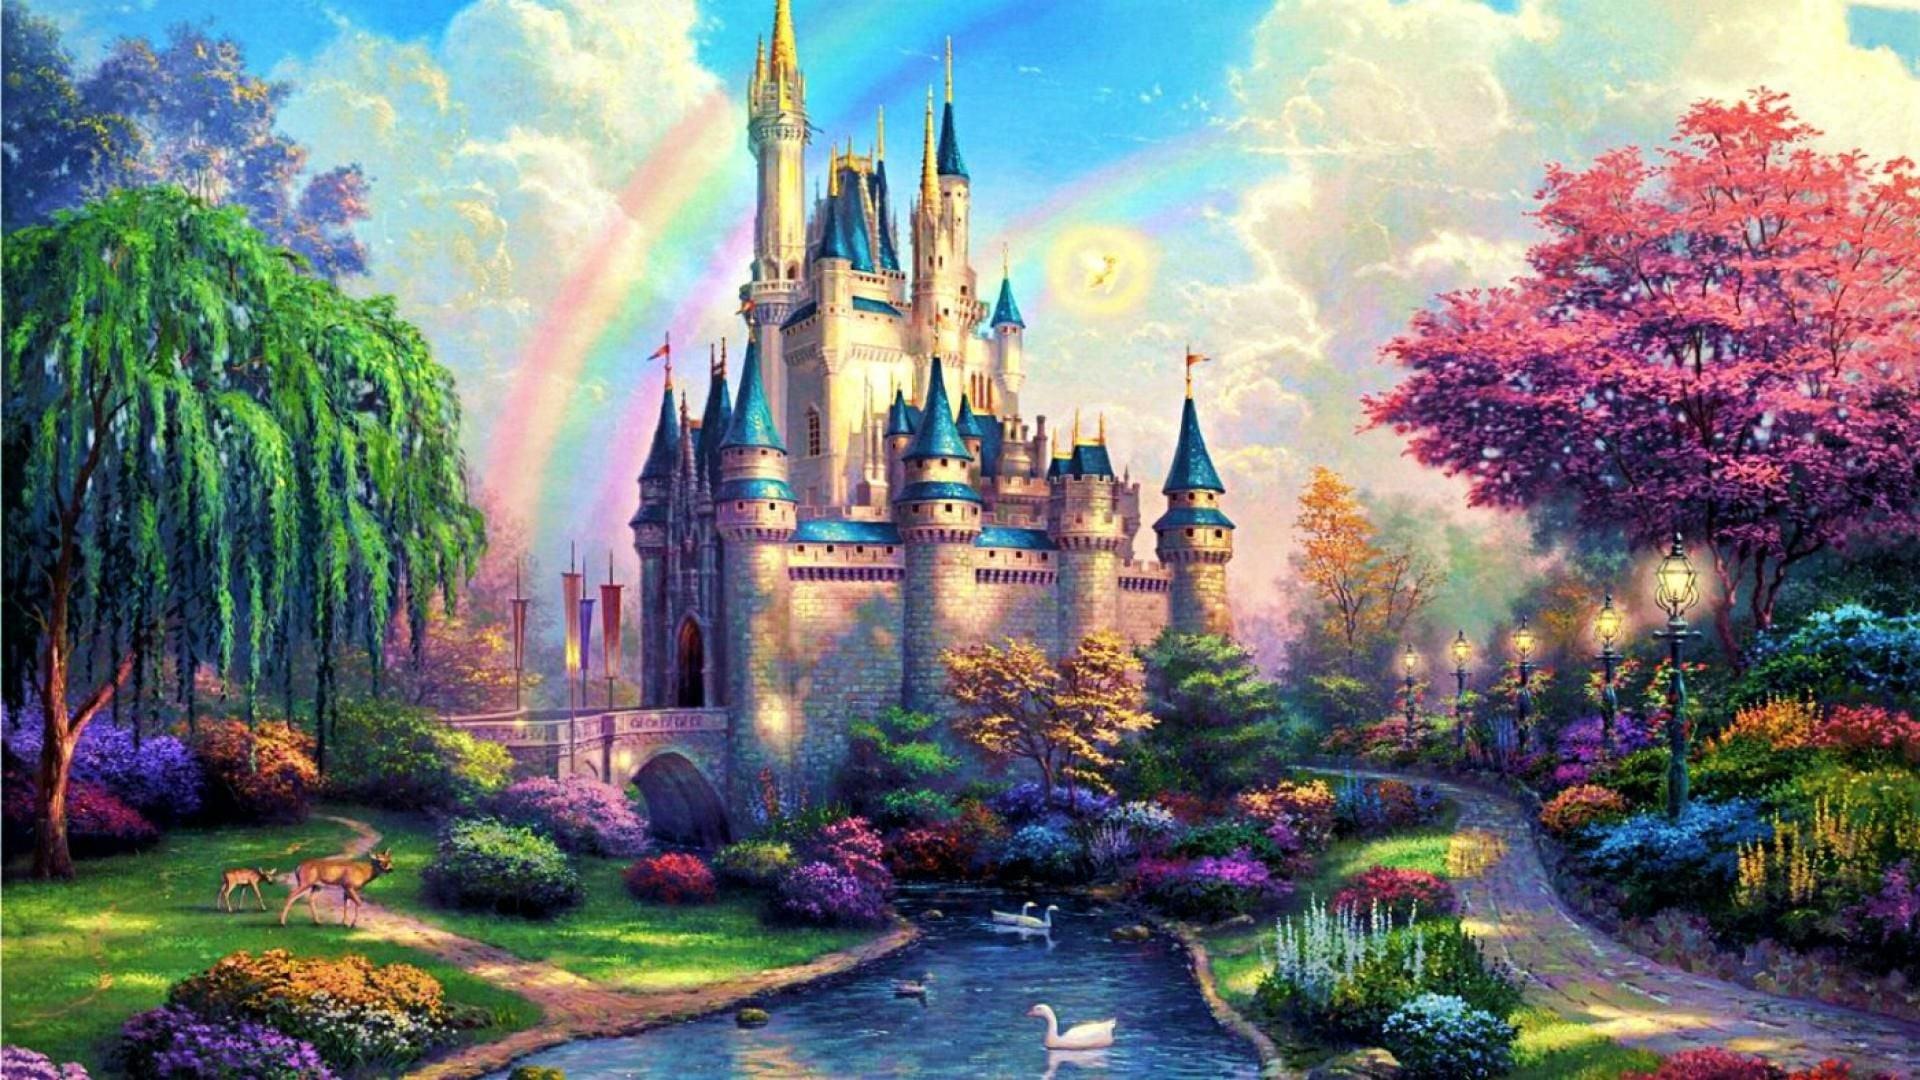 Disney Desktop Wallpaper Hd: Disney Castle Wallpaper HD (72+ Images